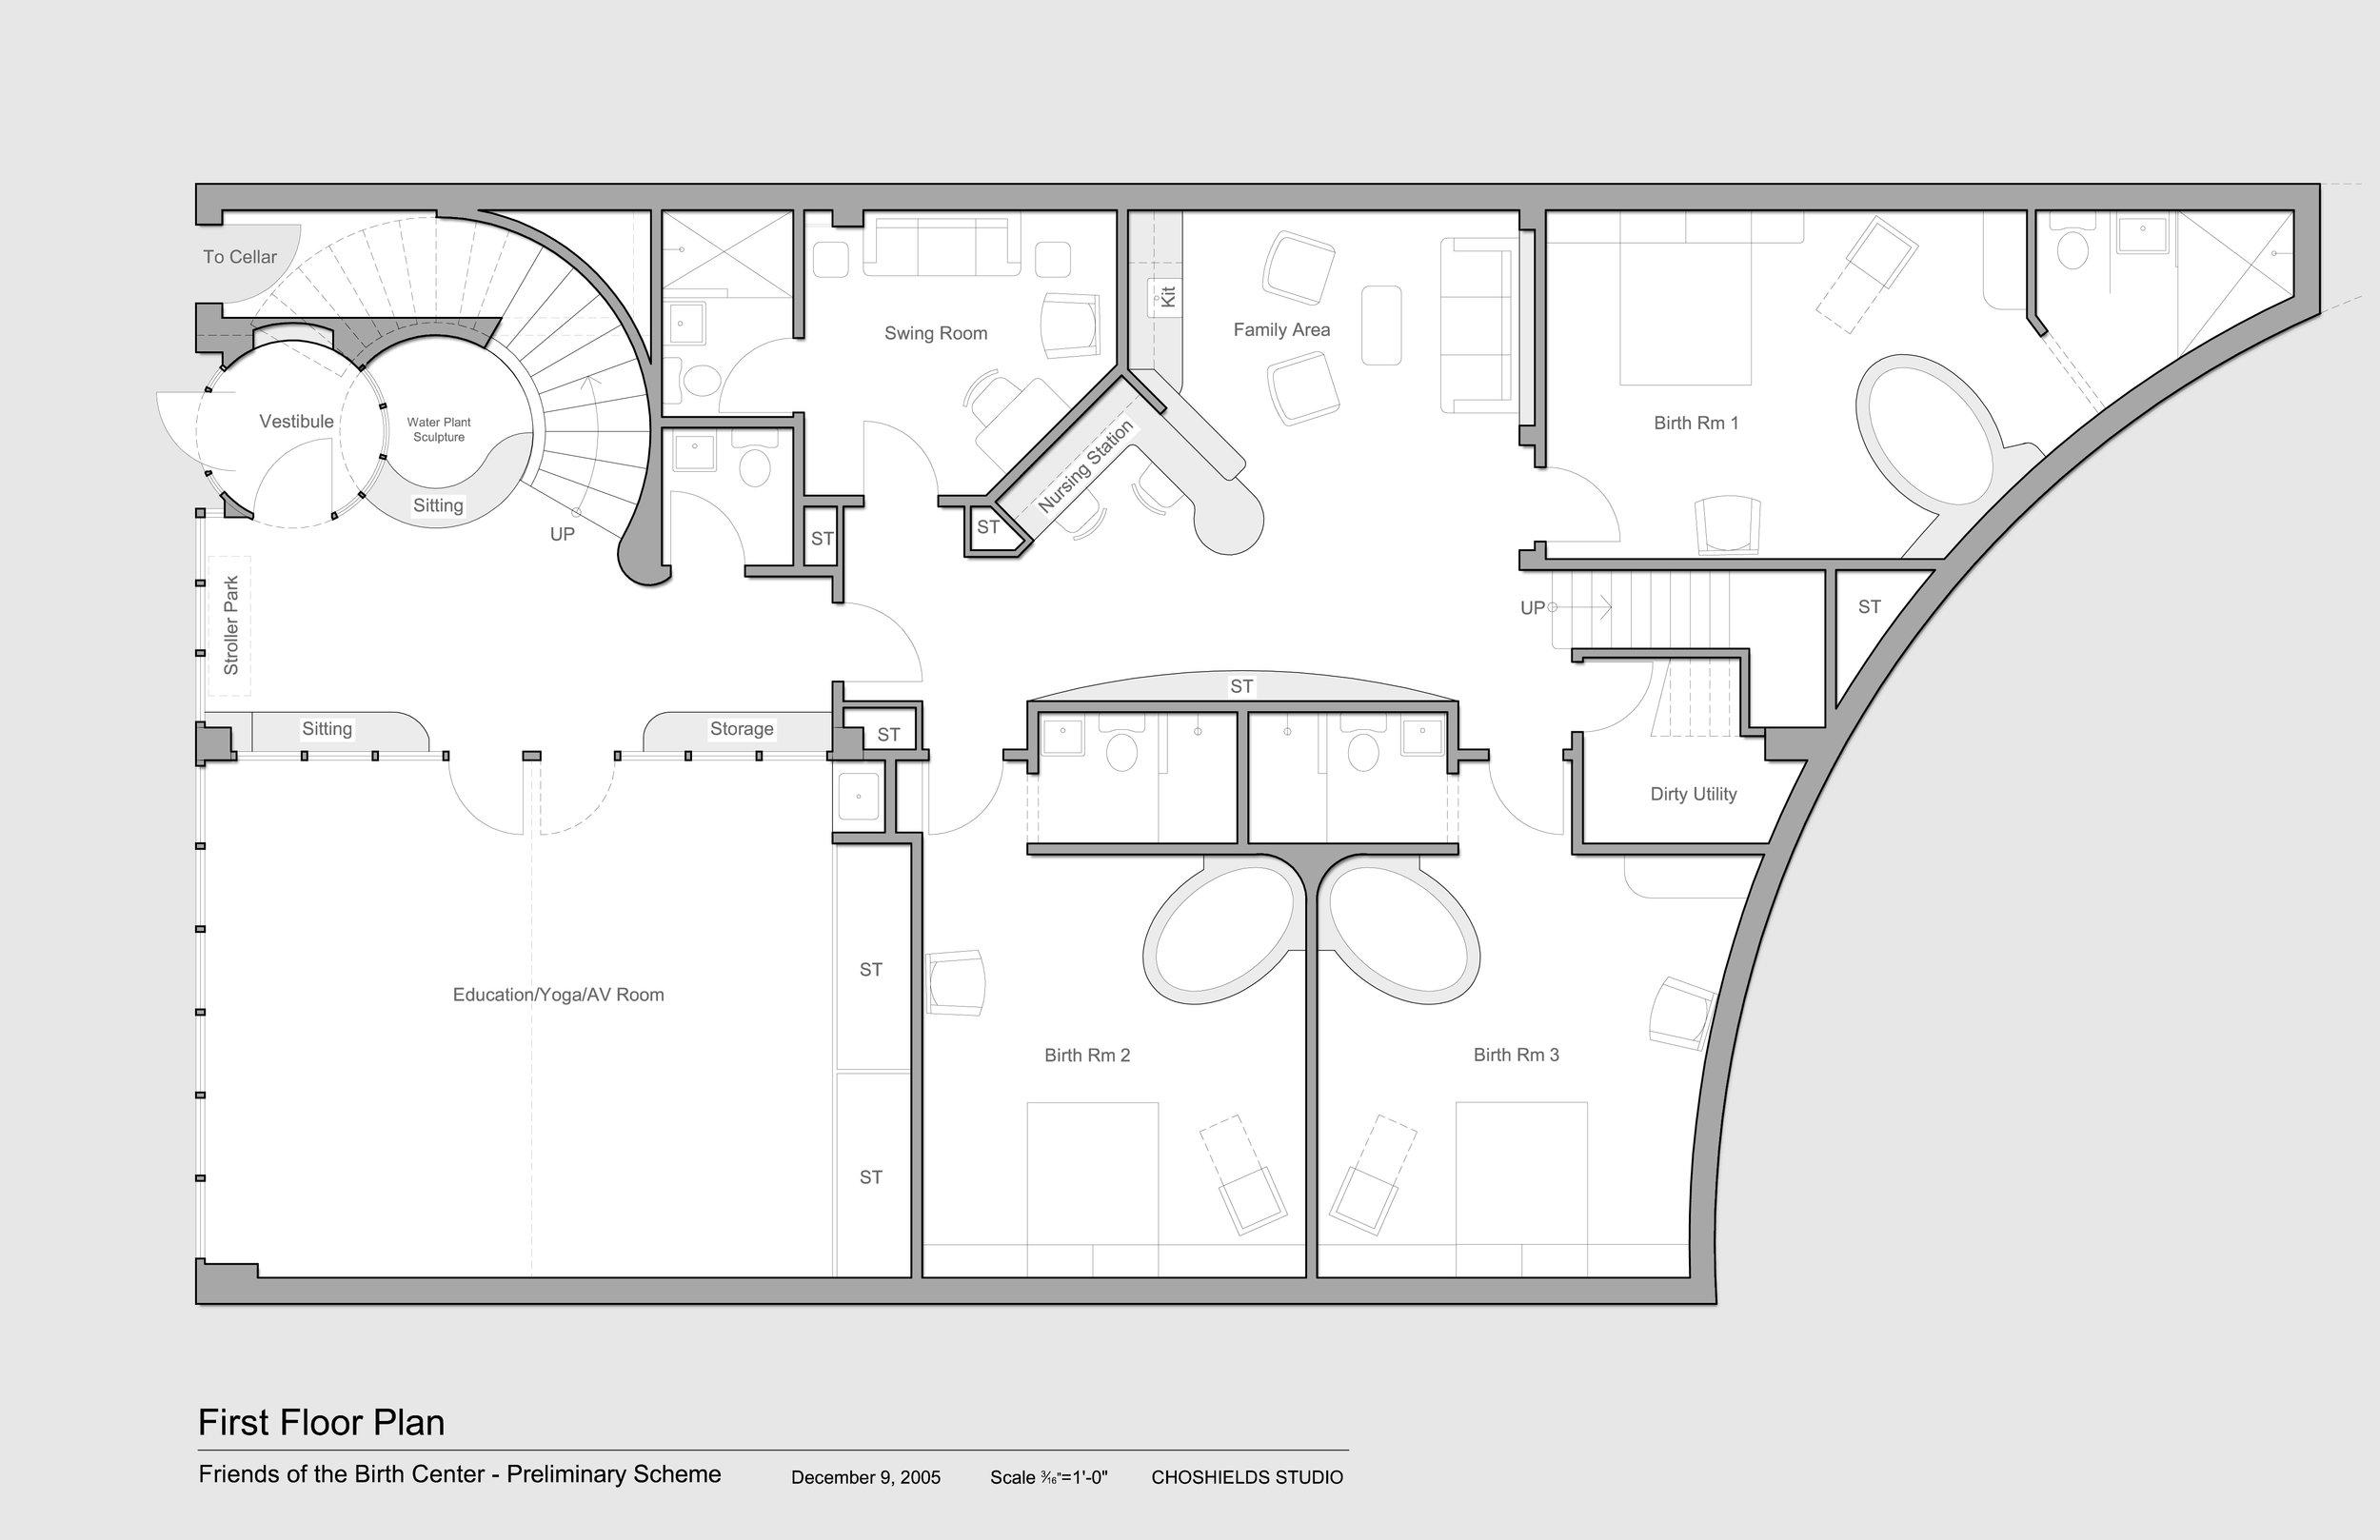 Birthing Center Choshields Studio